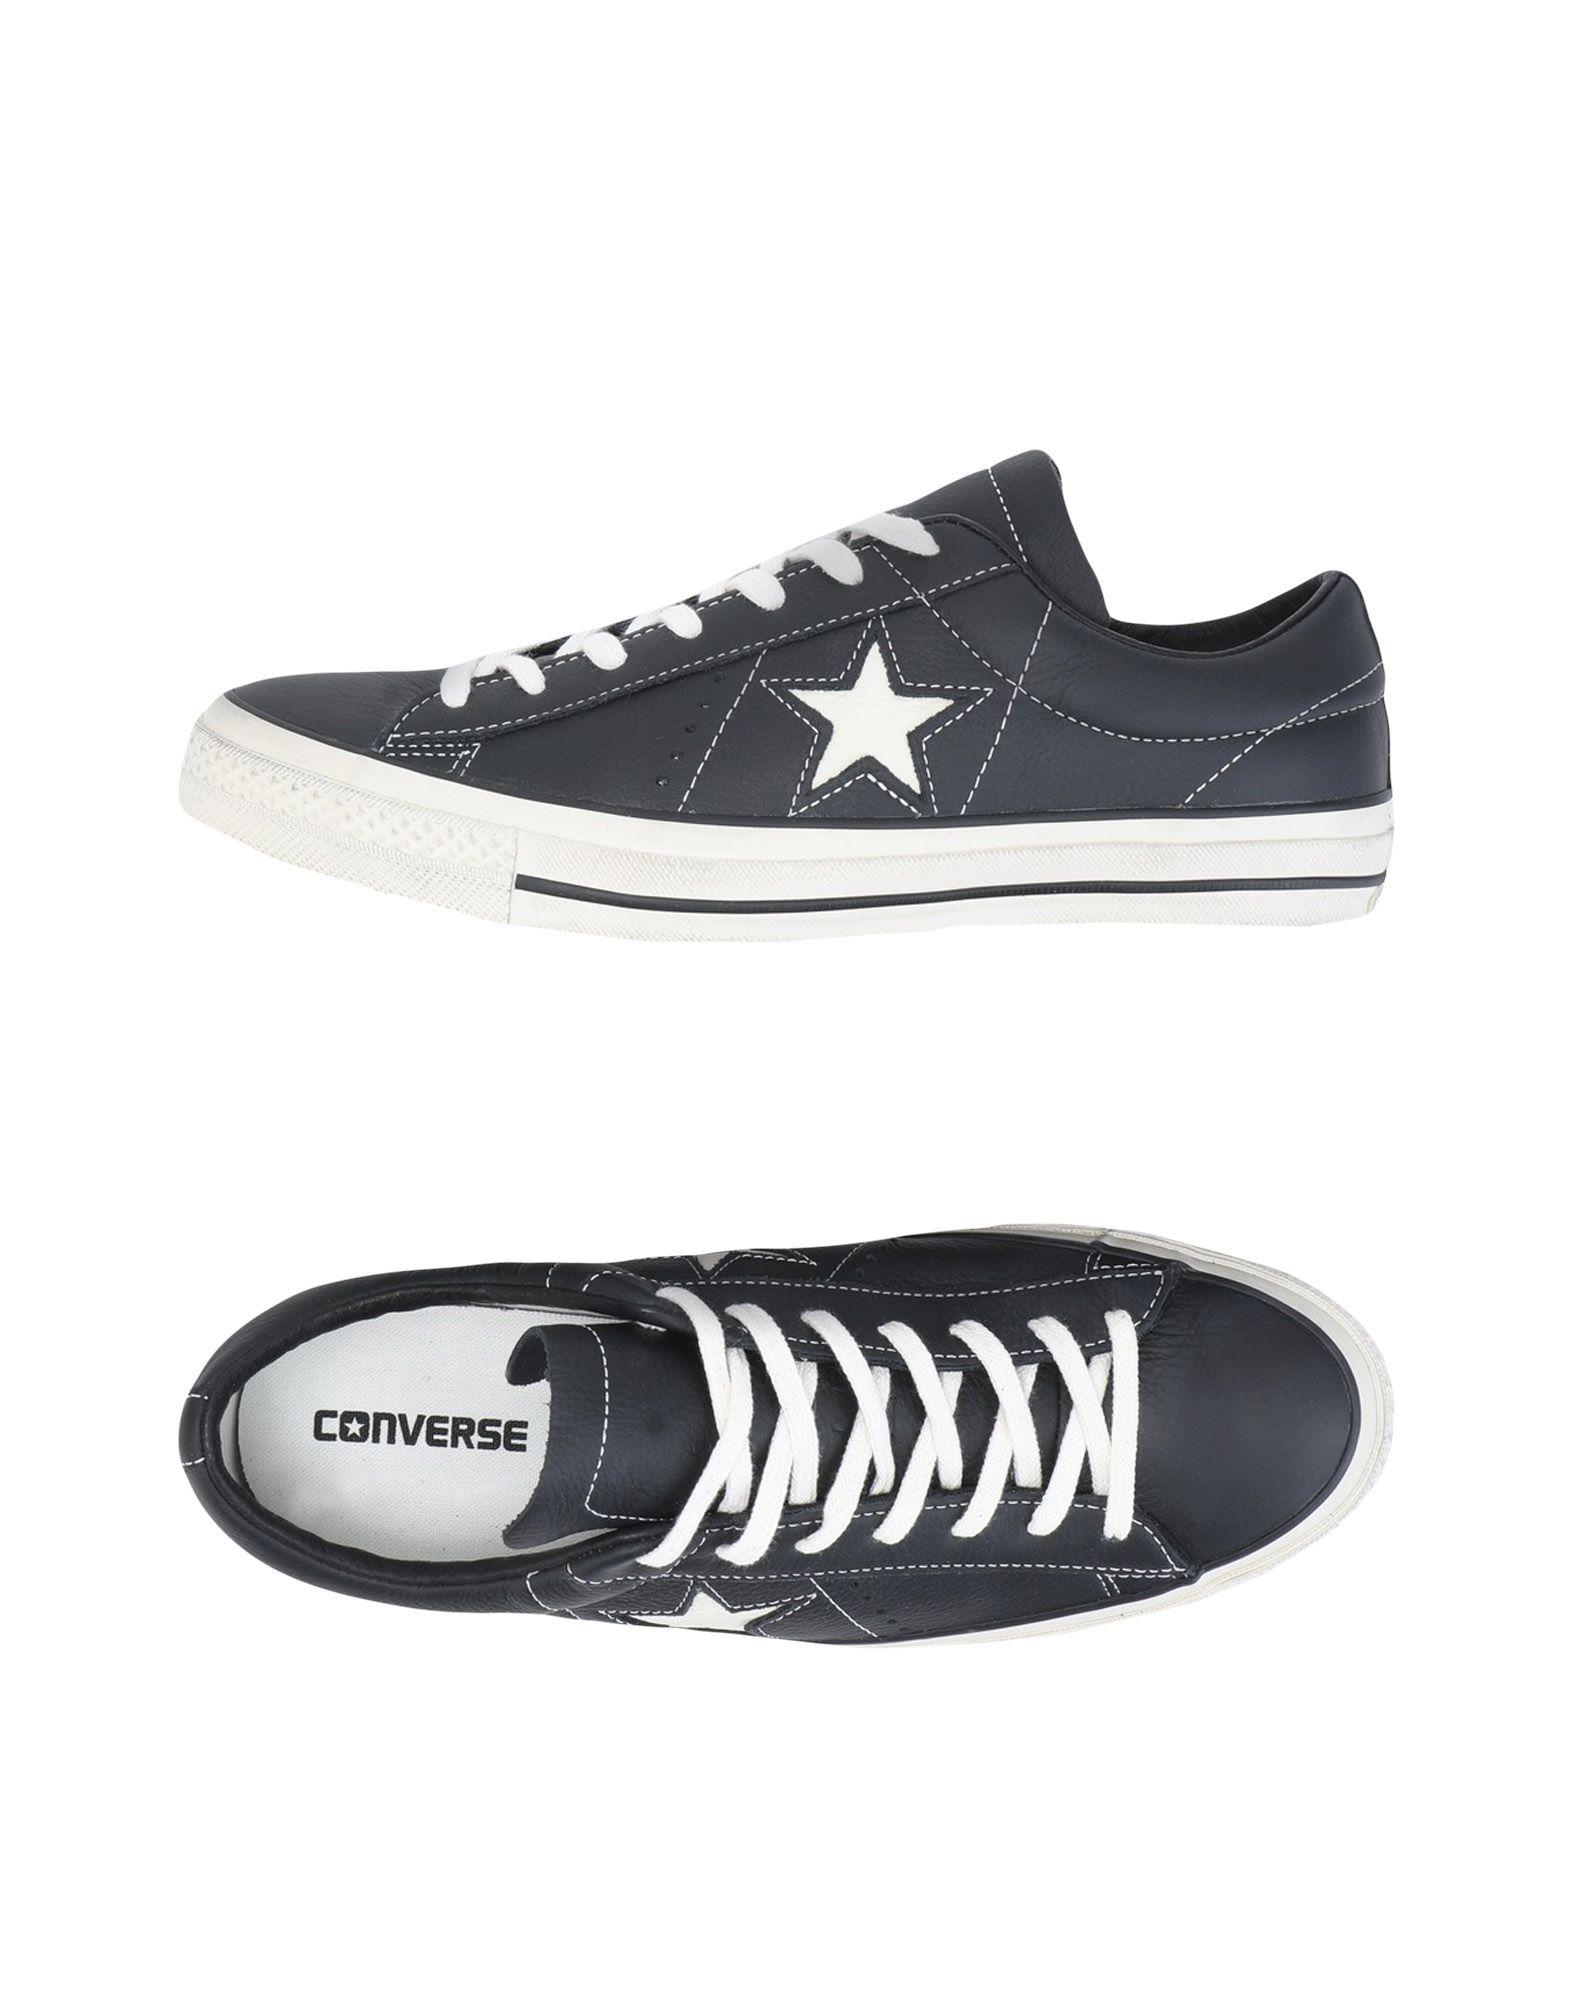 CONVERSE ALL STAR Низкие кеды и кроссовки